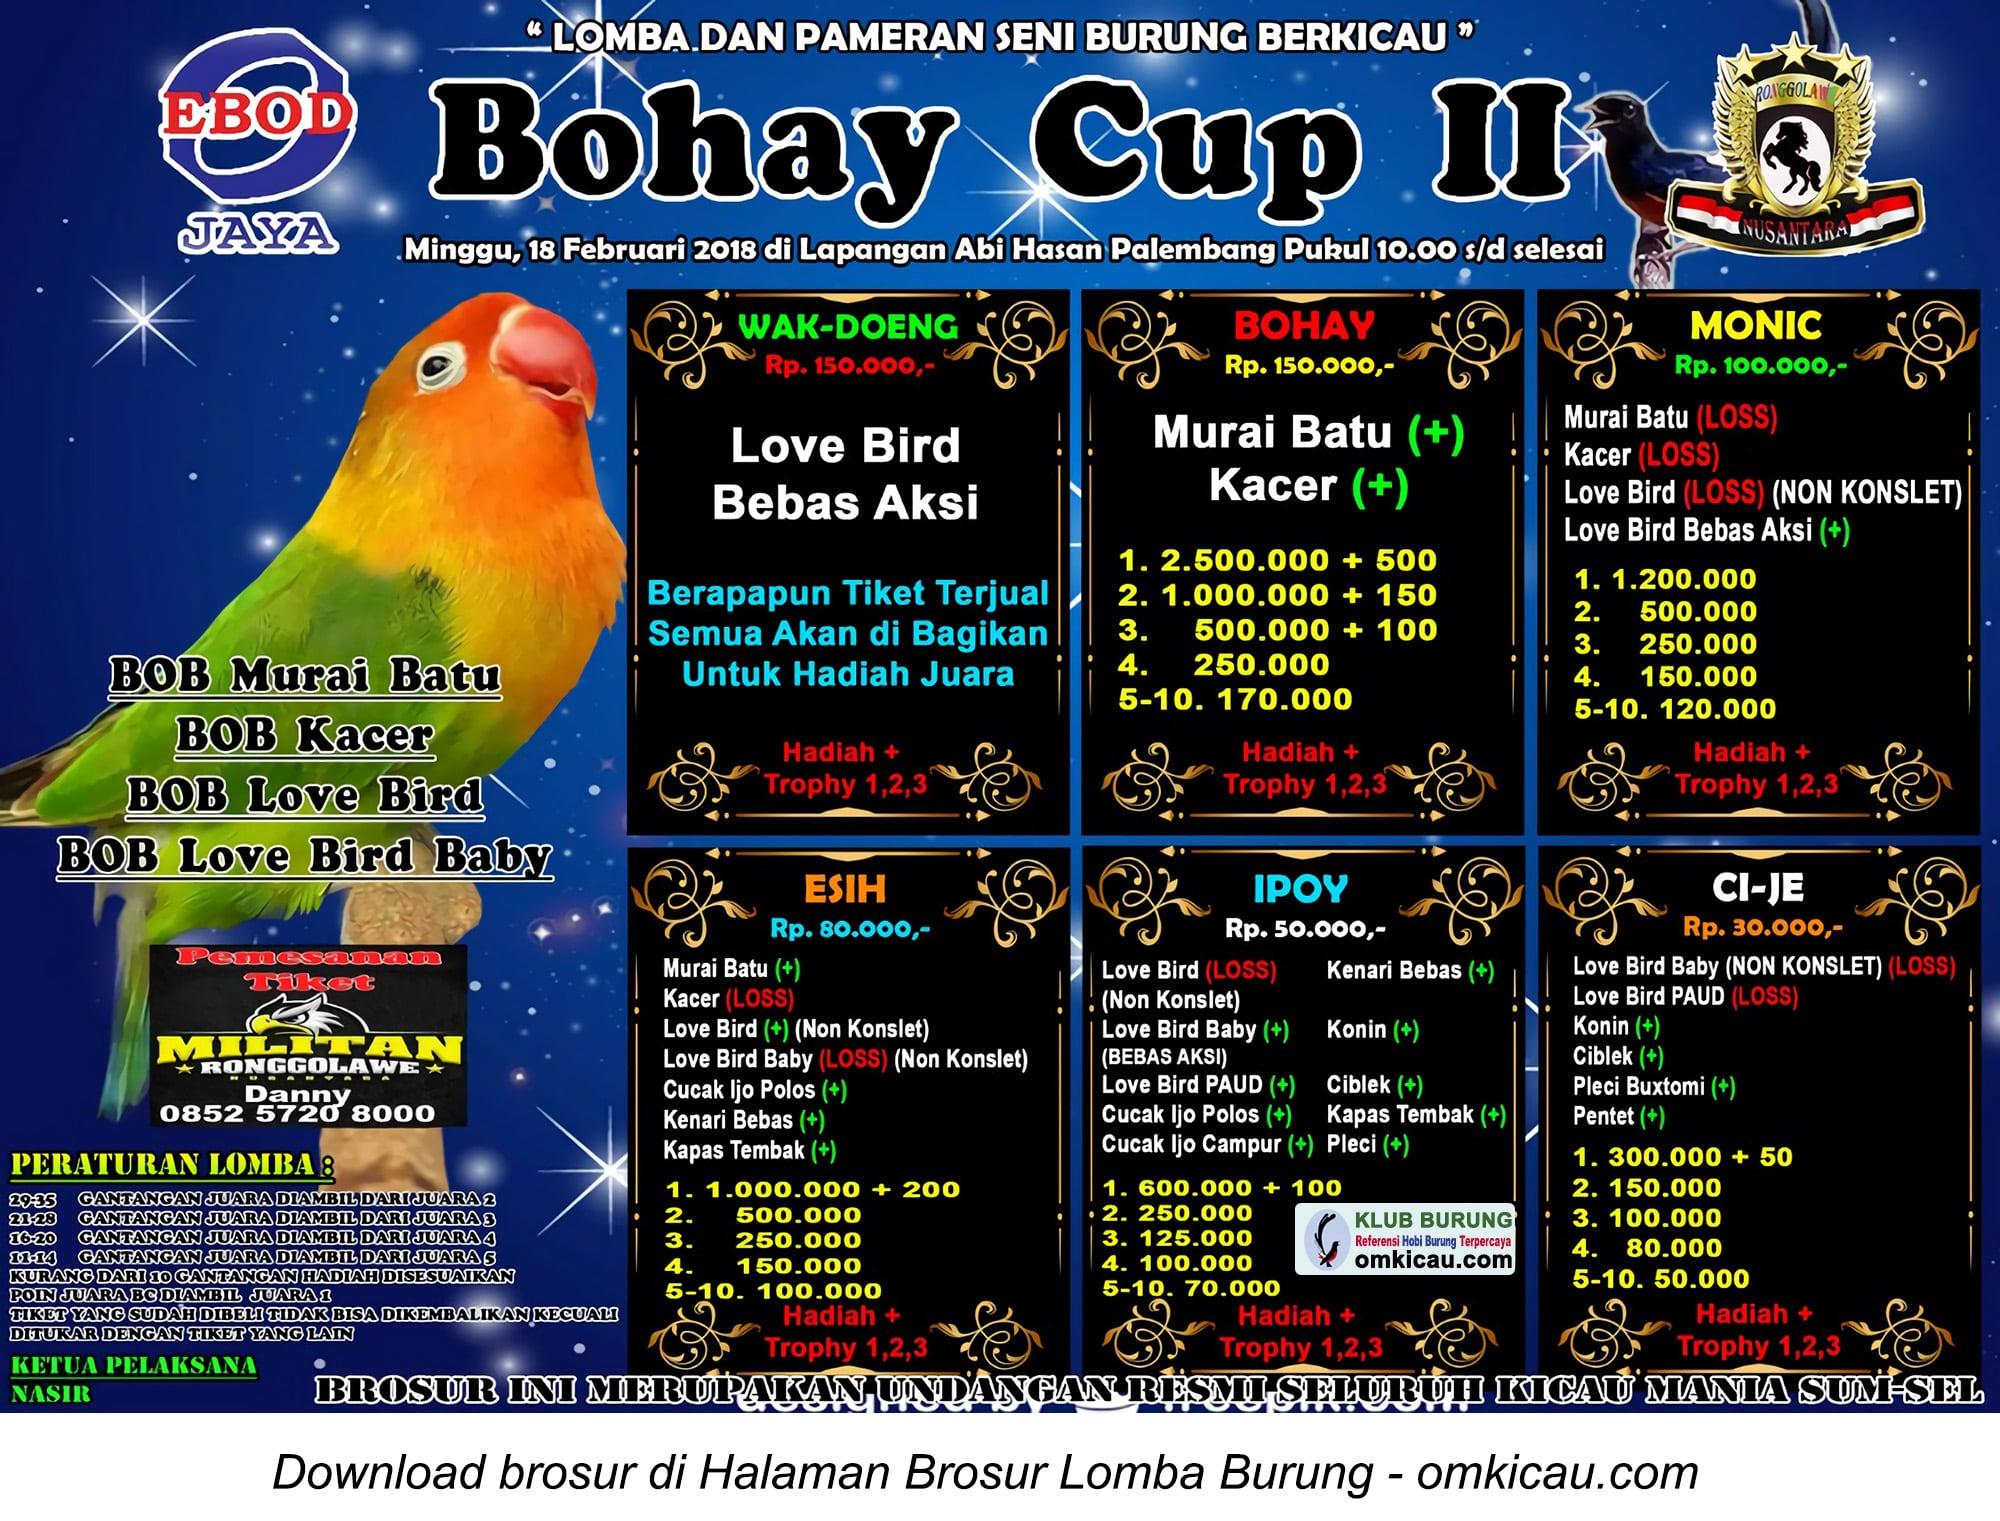 Lomba Burung Berkicau Bohay Cup Ii Di Palembang Minggu 18